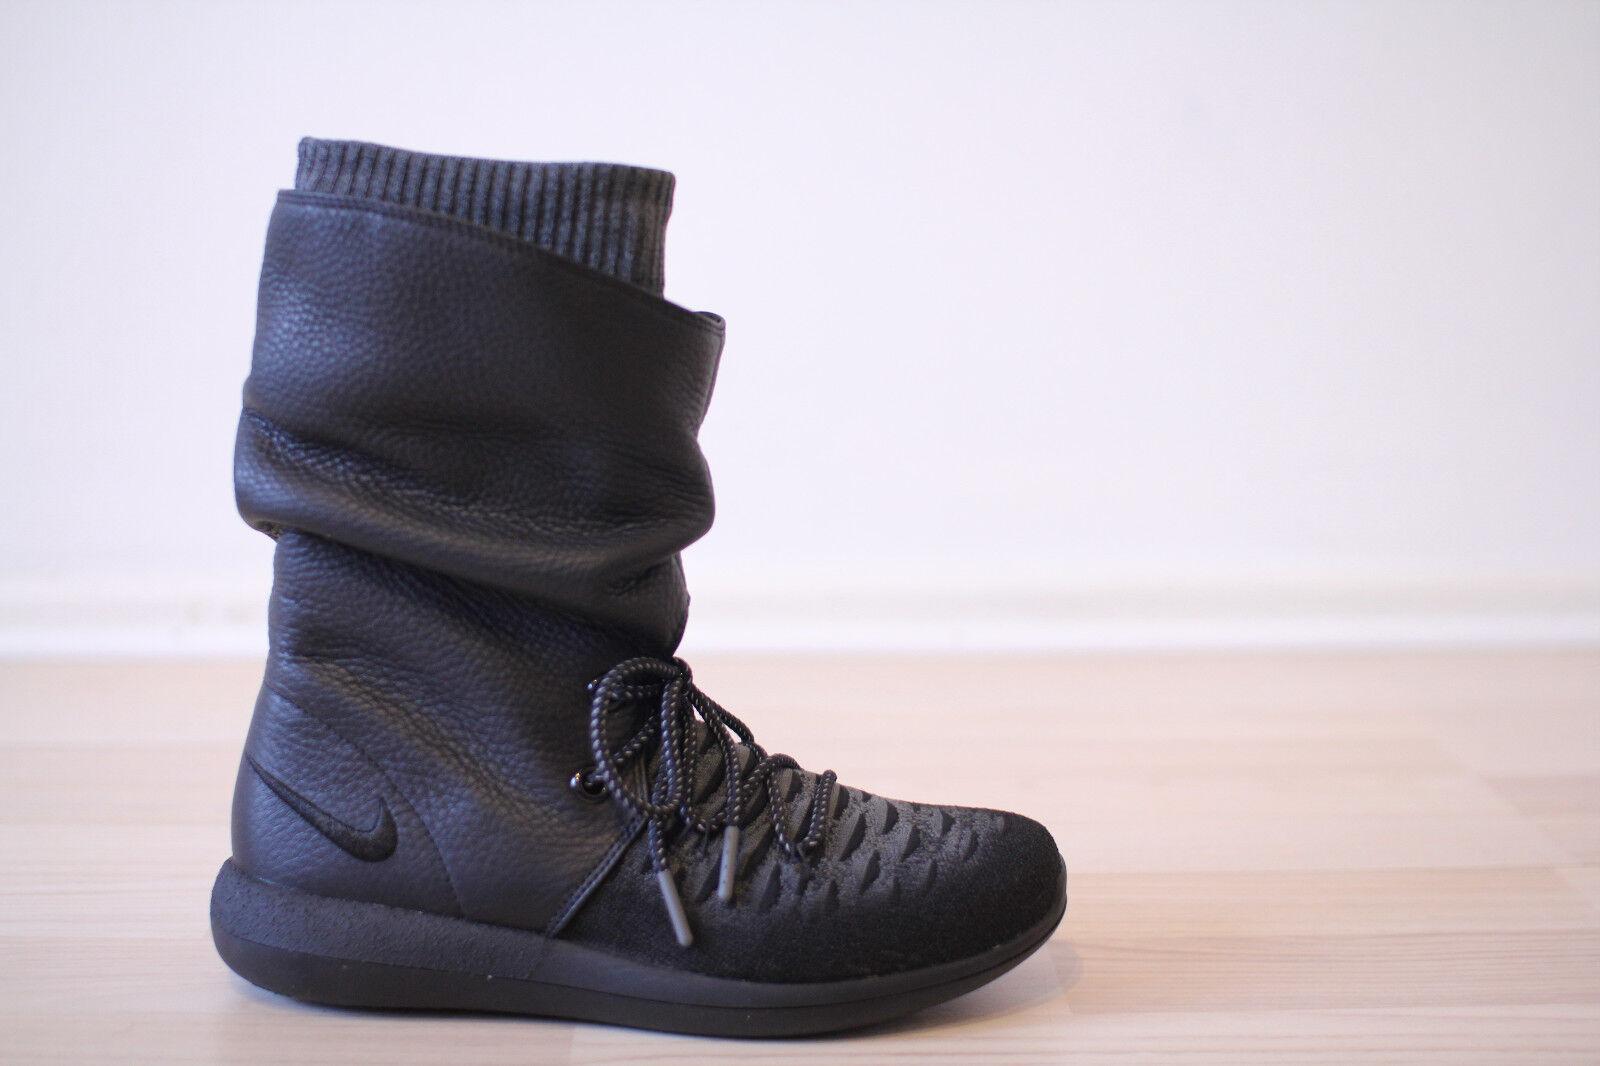 Nike Roshe Two Hi Hi Hi Flyknit black WMNS Gr. 37,38,39,40 NEU & OVP Winterstiefel dbd5b4